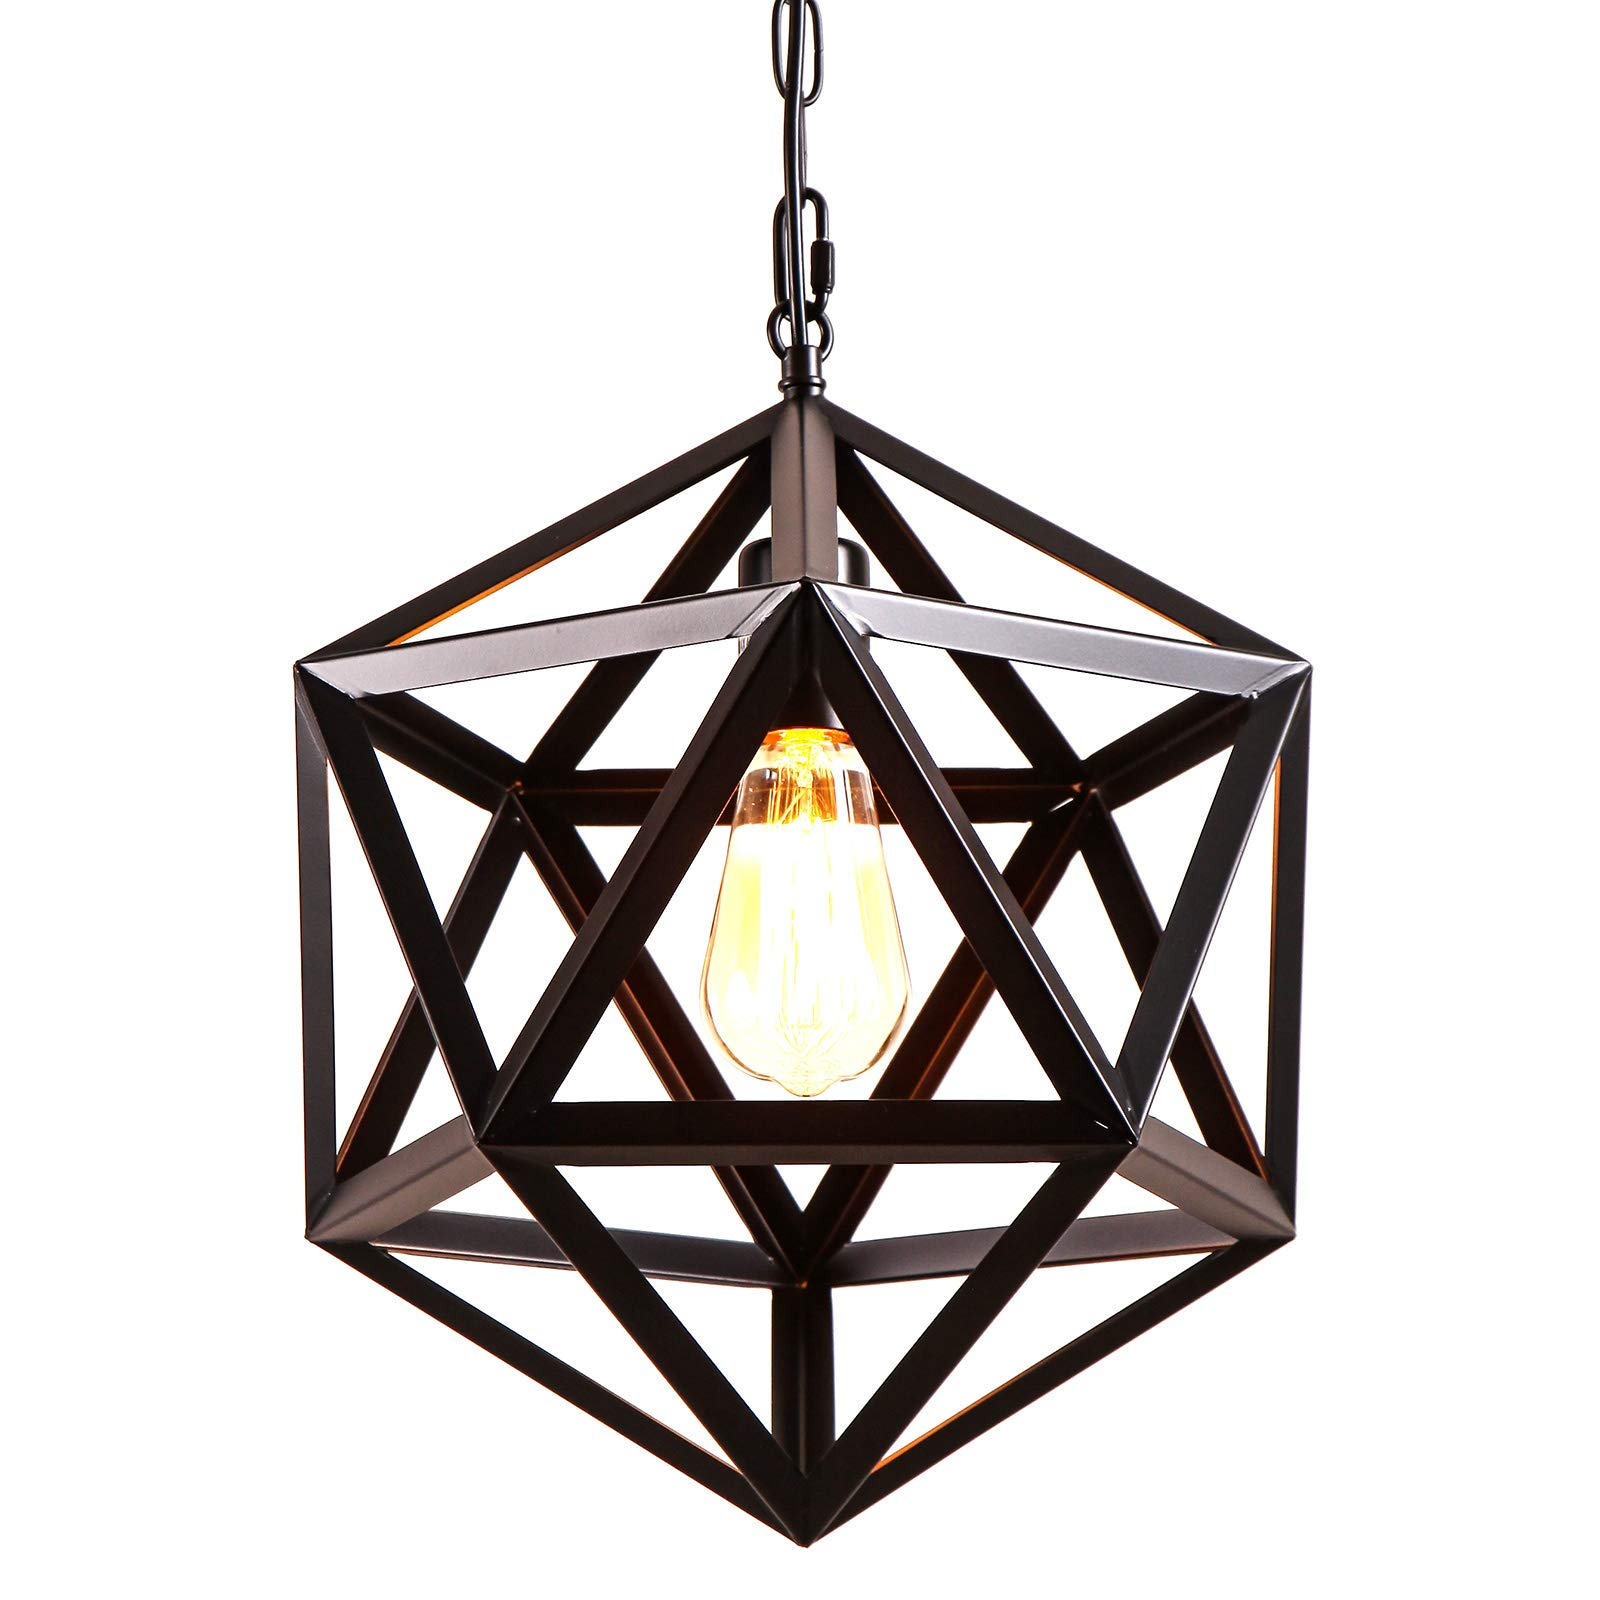 AIDOS Geometric Pendant Light Industrial, Matte Black, Polyhedron Pendant Lighting Vintage Industrial Wrought Iron Metal Hanging Light Fixture for Bar,Restaurant, Cafe, Farmhouse, Barn